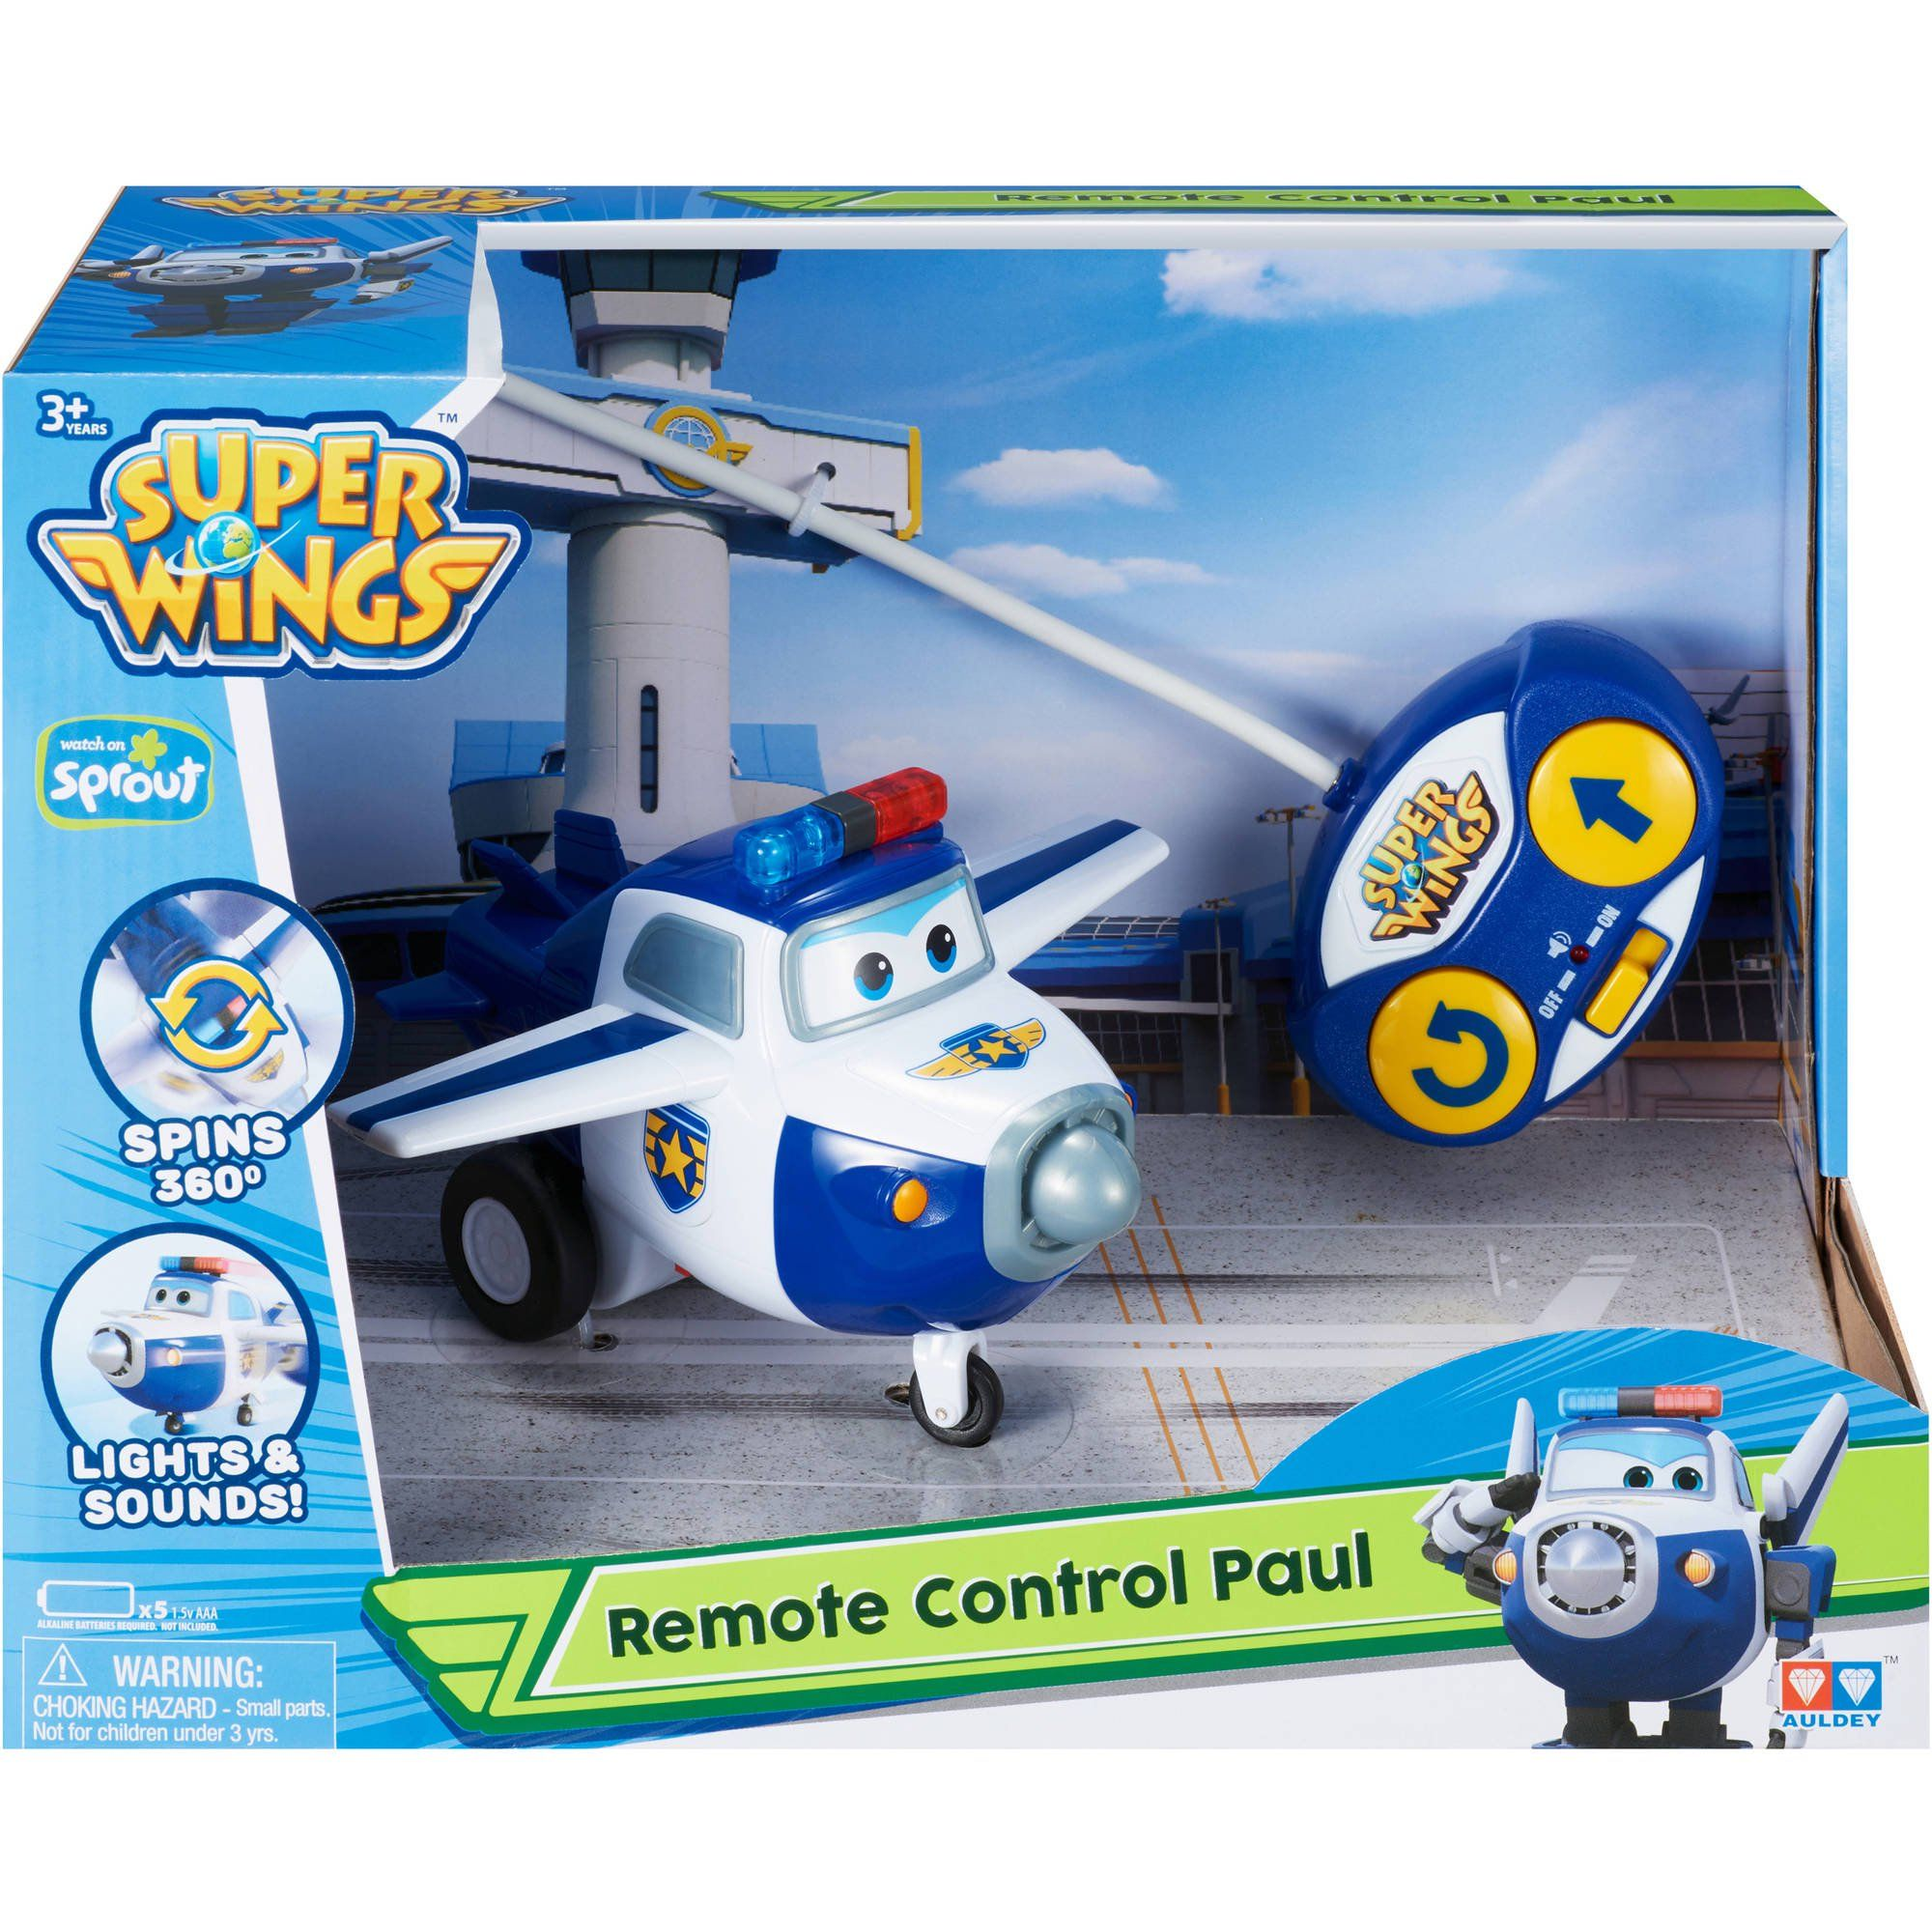 Super Wings Remote Control Paul Walmart Com In 2020 Remote Control Remote Remote Control Toys